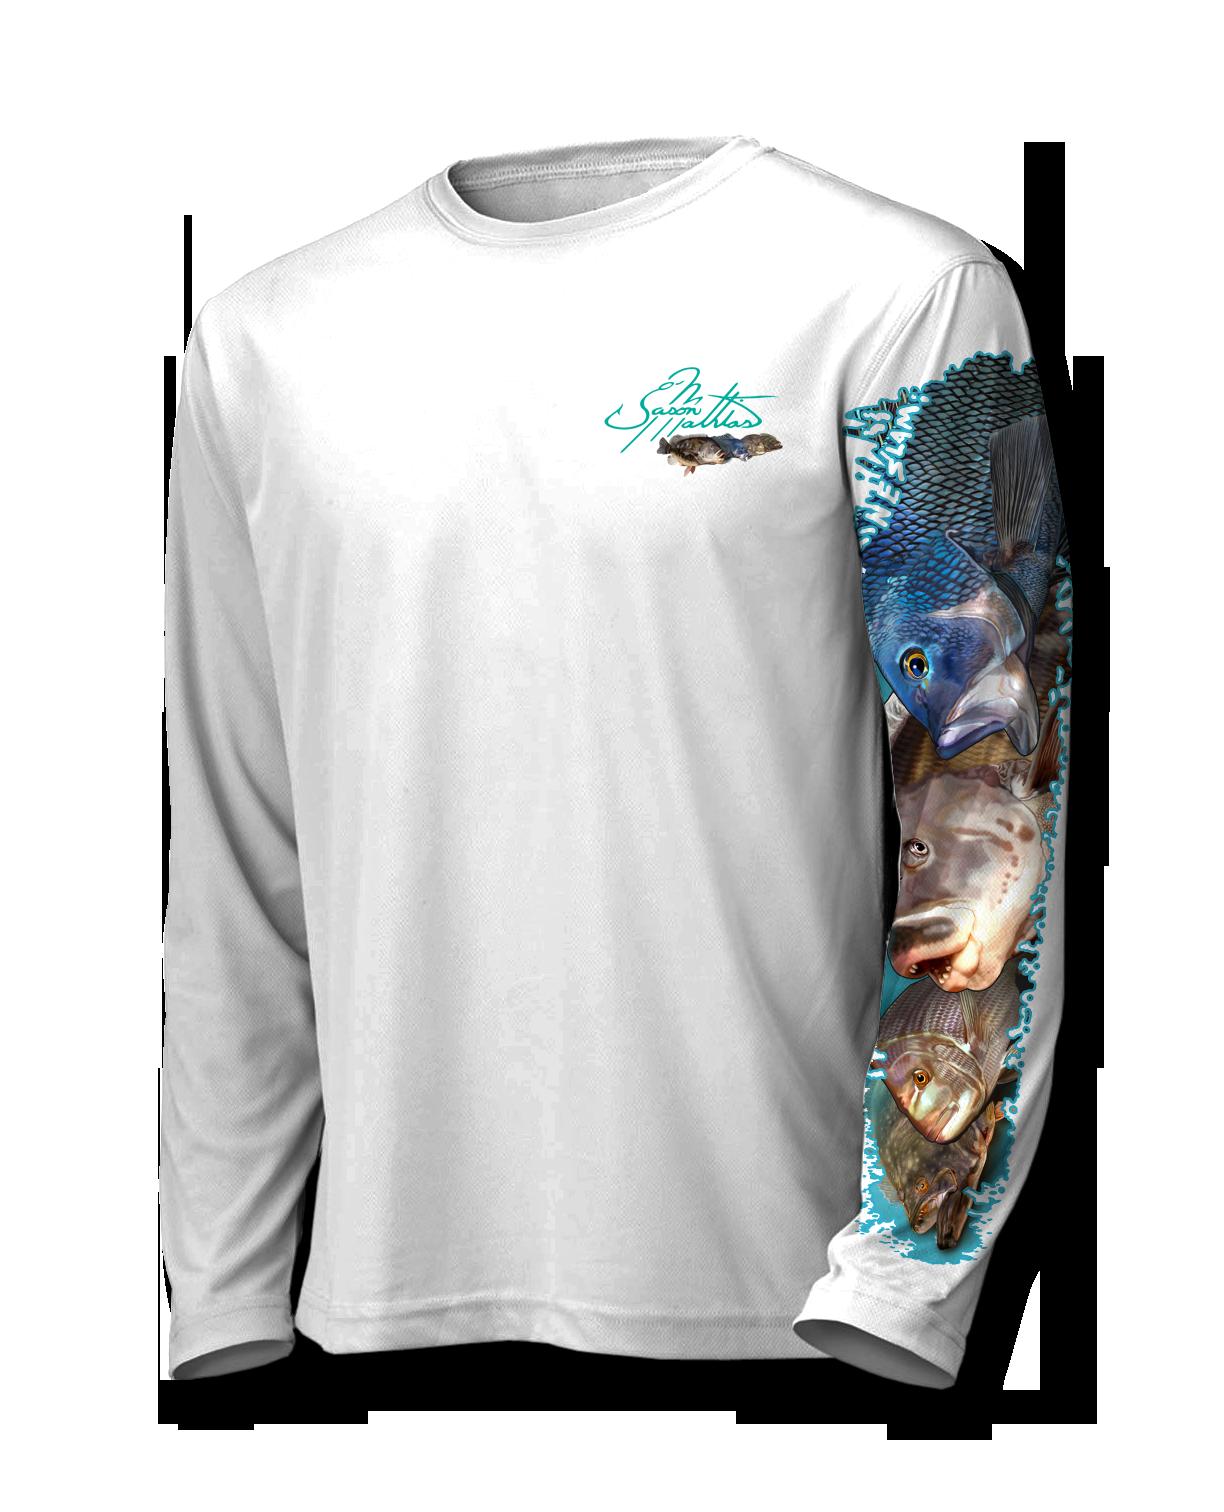 ne-bottomfish-slam-shirt-front-jason-mathias.png